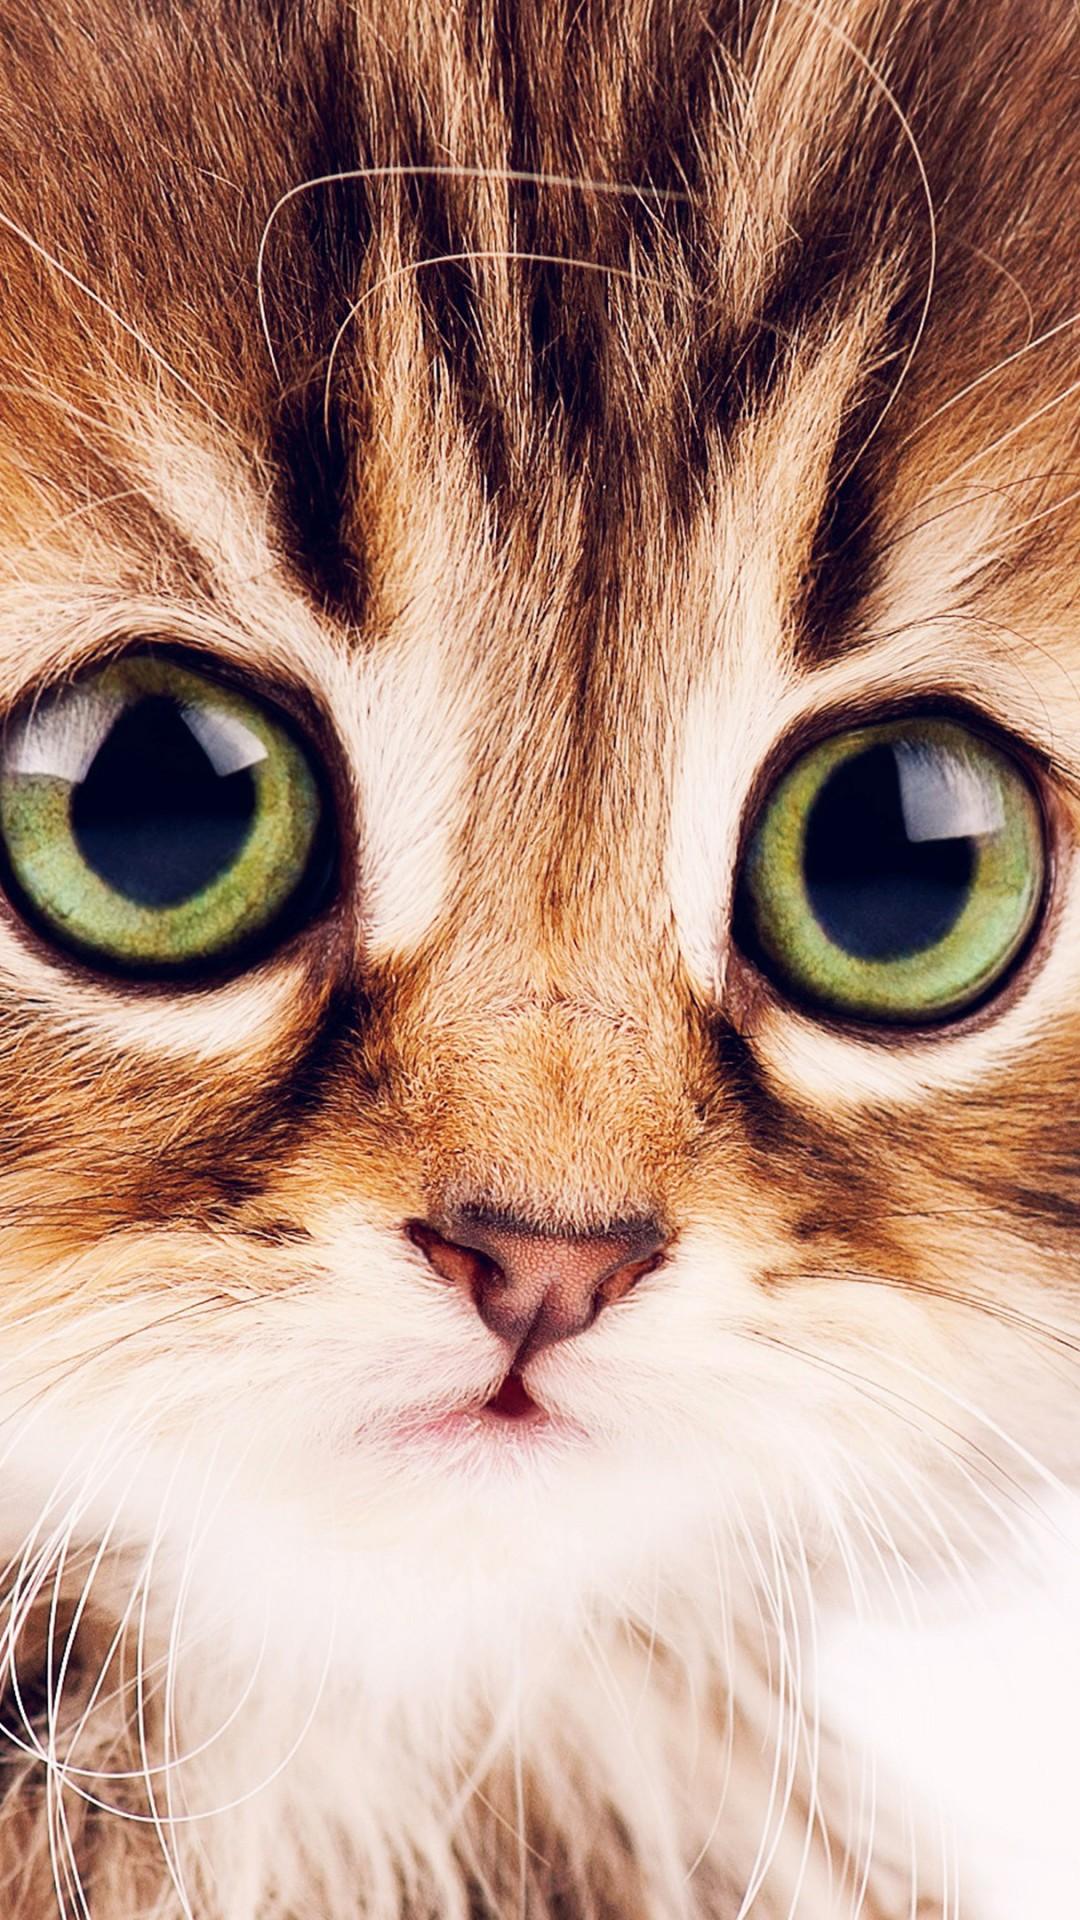 Cute Cat Hd Wallpaper Download Wallpaper Kitten Cute Funny Animals 4k Animals 16151